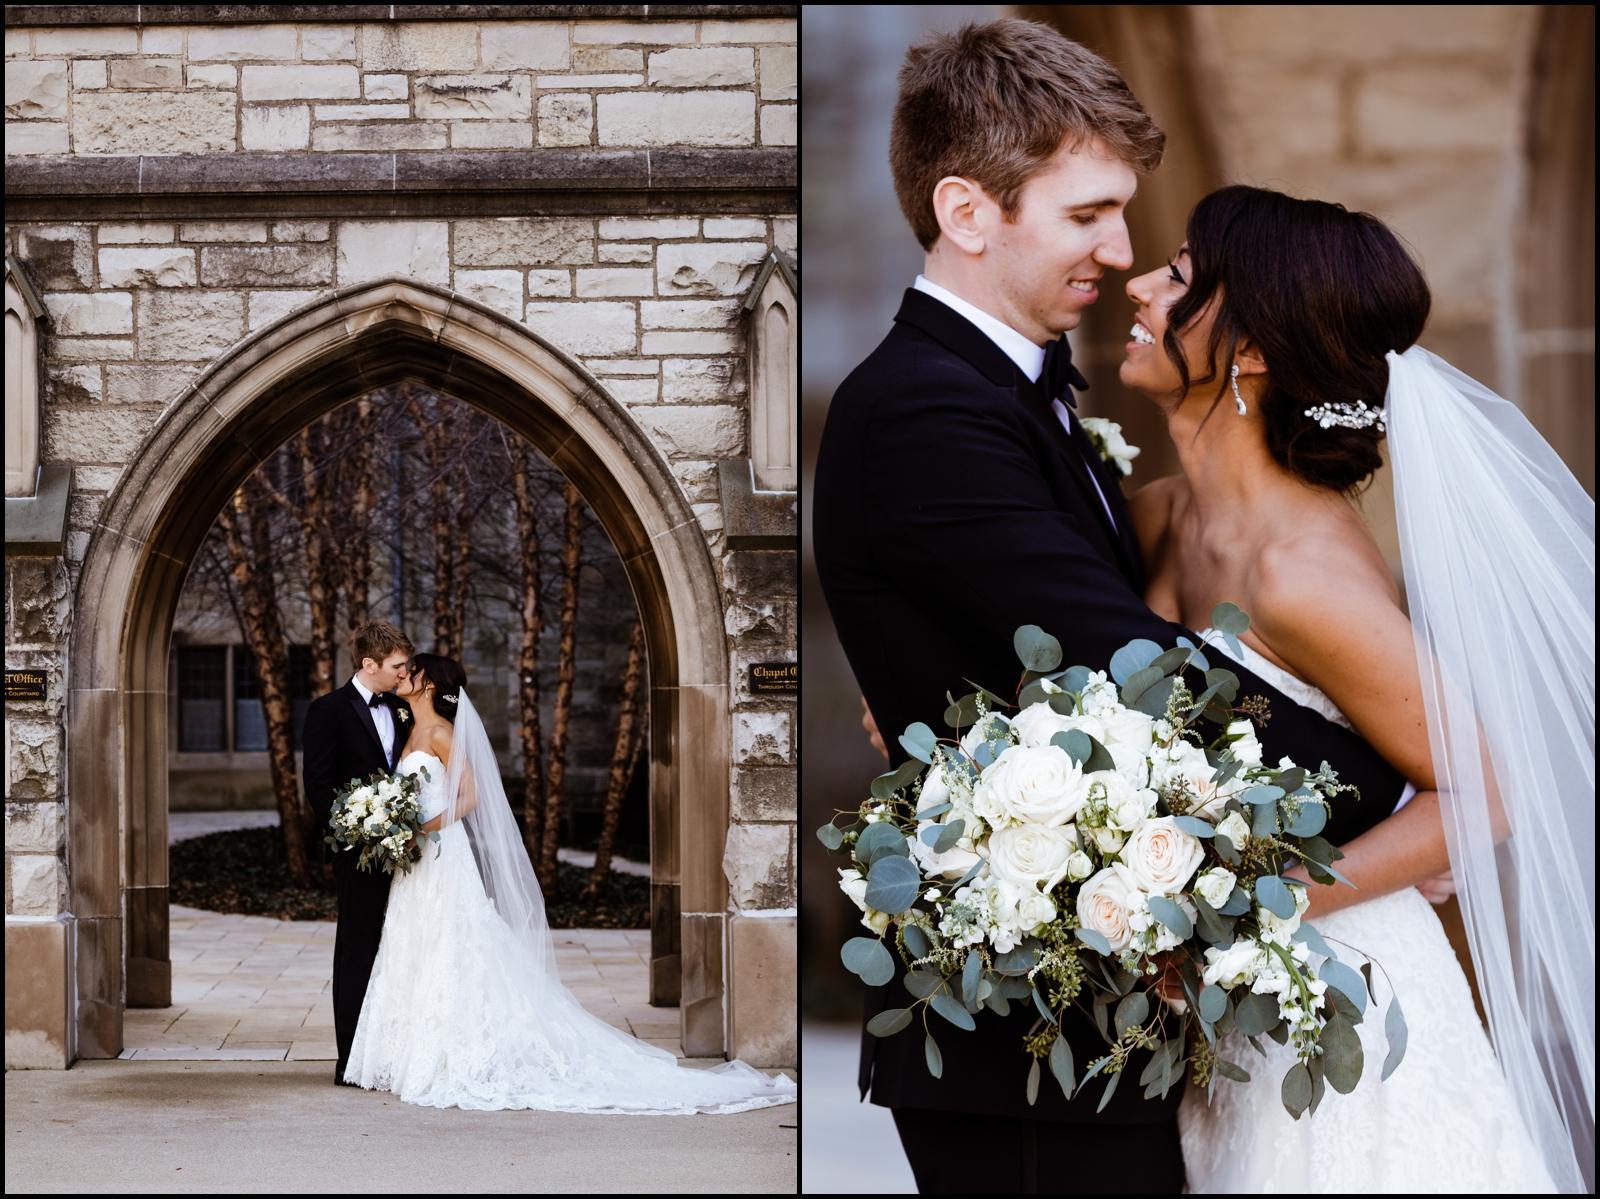 Chicago Wedding- Alice Millar Chapel Ceremony, London House Reception_0082.jpg